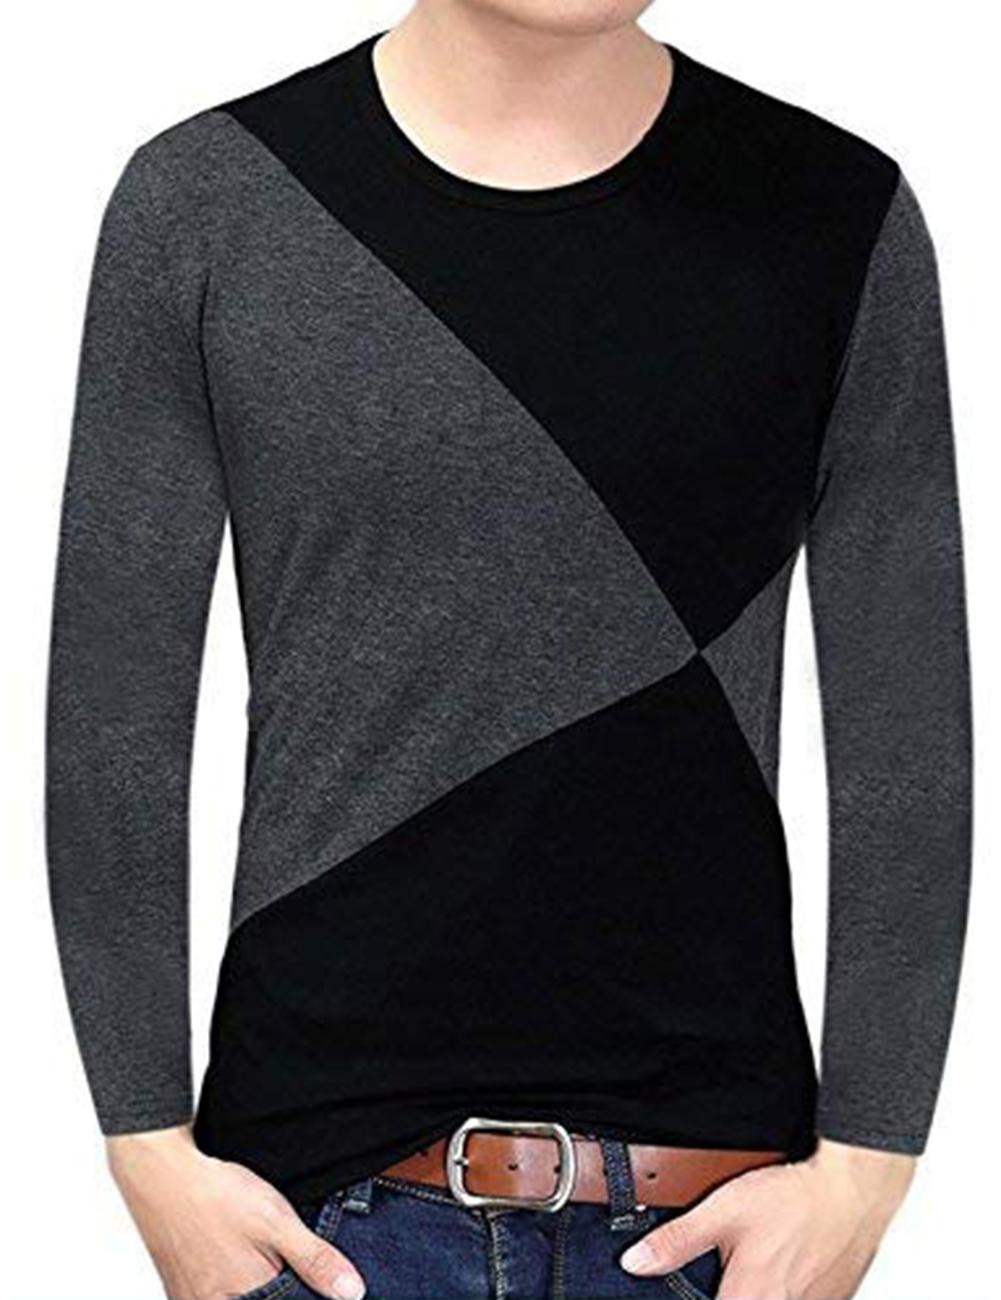 Yong Horse Men's Contrast Color Crew Neck Long Sleeve Basic T-Shirt Top Black-grey_L